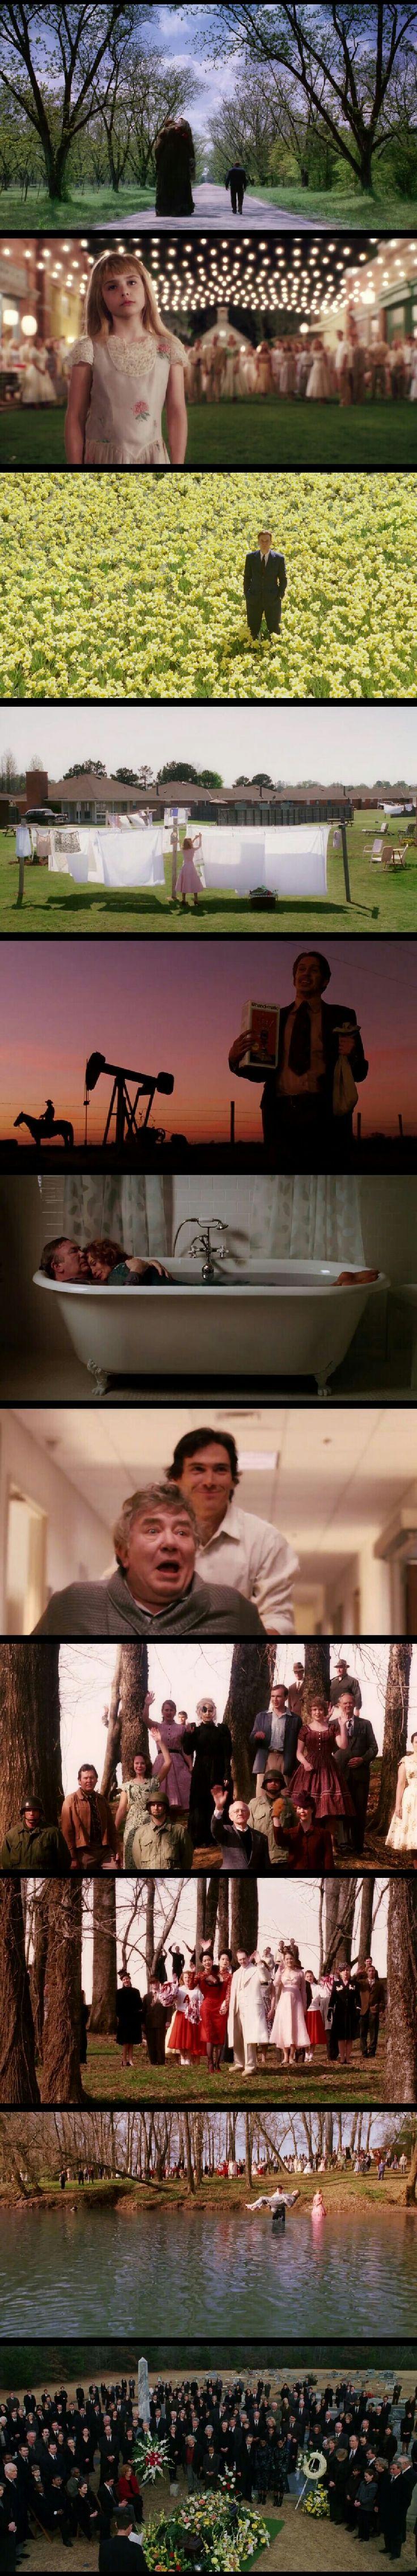 Big Fish(2003) Directed by Tim Burton.